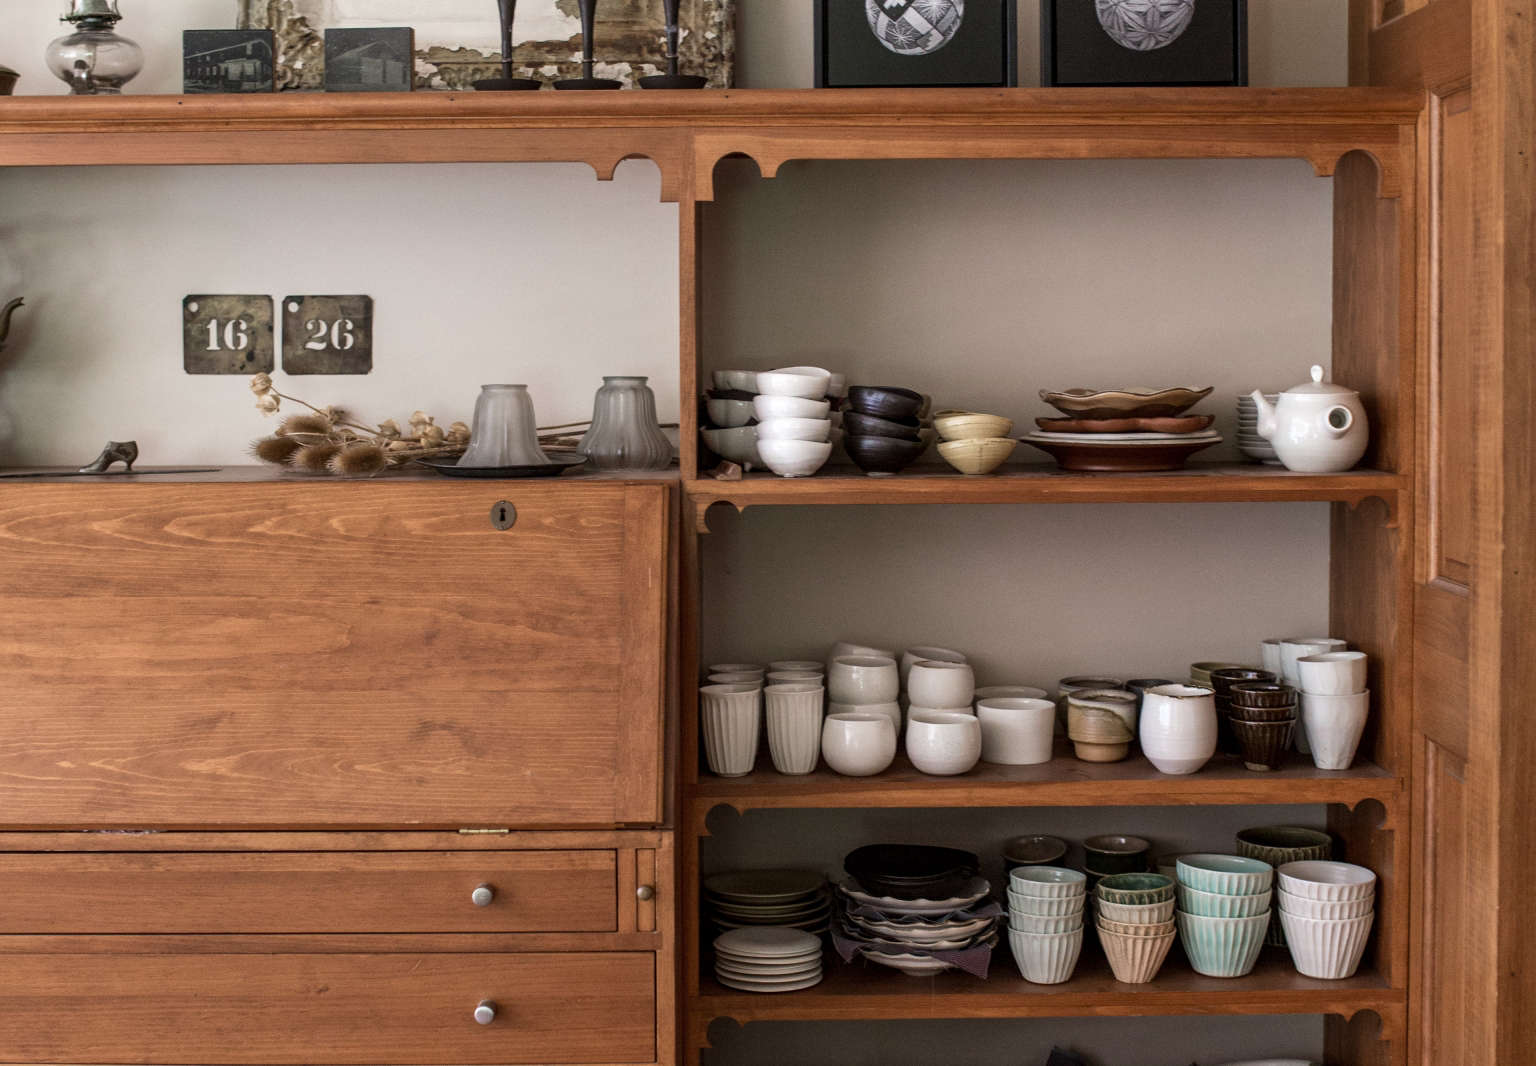 hanako nakazato union maine ceramics on shelves erin little